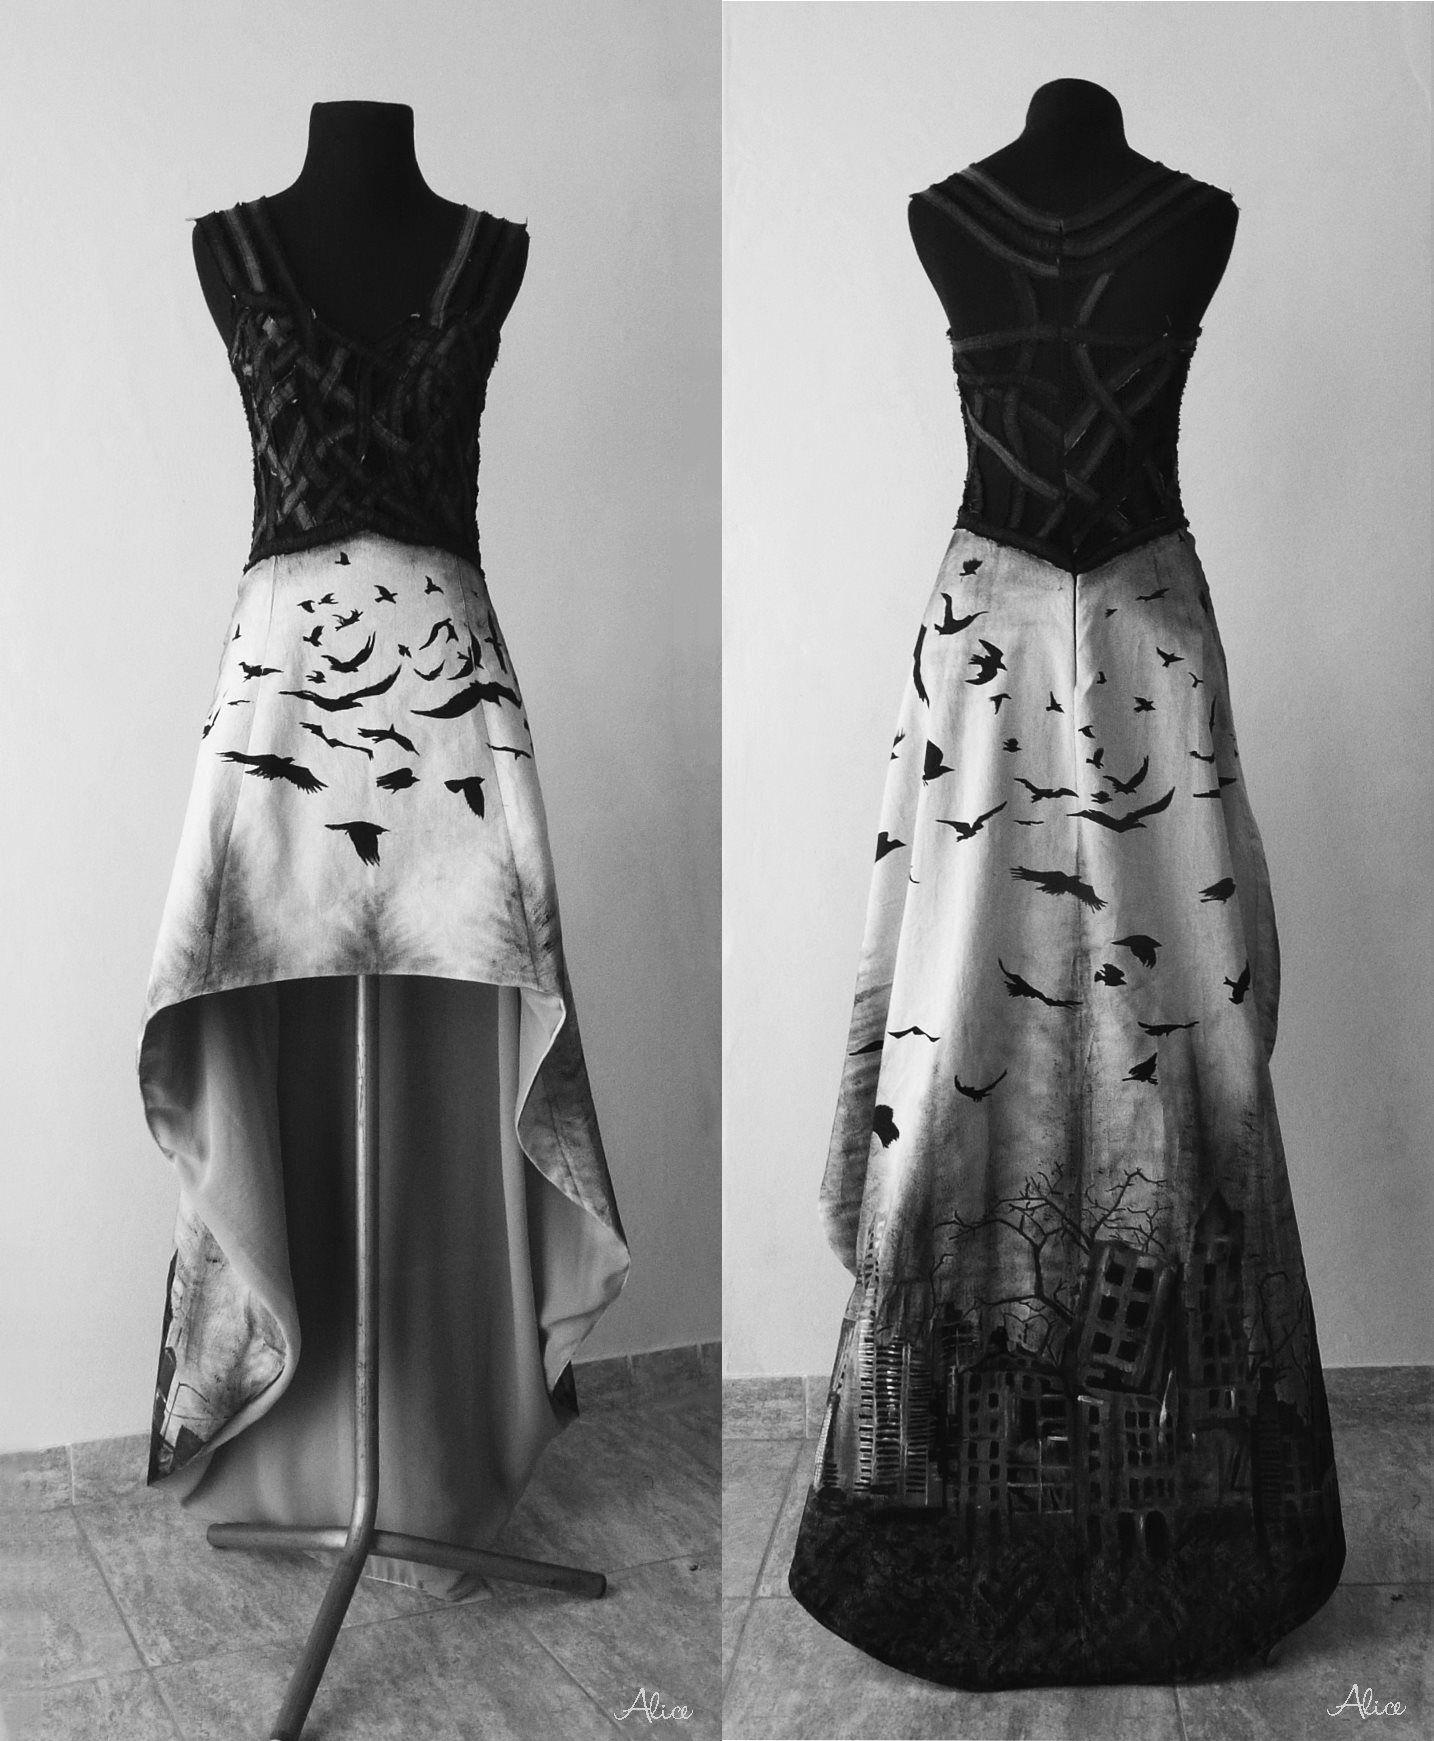 Katatonia inspired dress by alice dz dresses pinterest alice